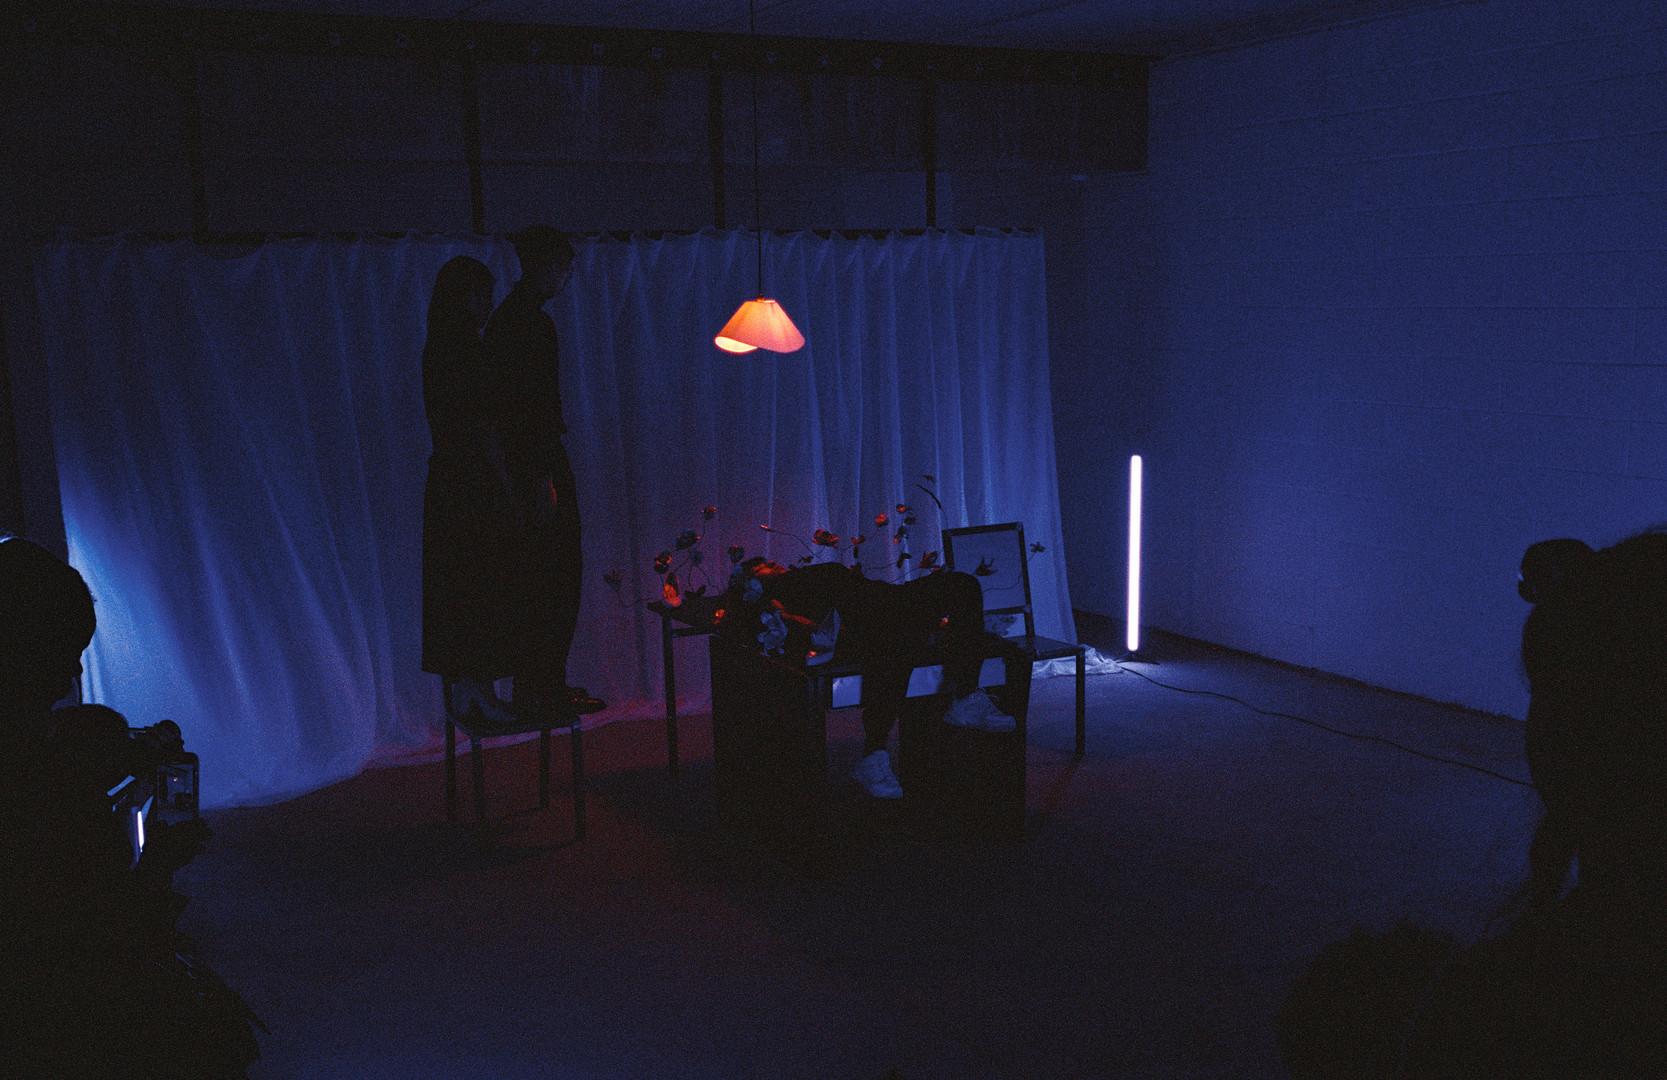 FrancisJohn Chan, Ghost Chan and Iris Chan in TROPISM Study 2: Theatre of Remembrance by Nhu Xuan Hua